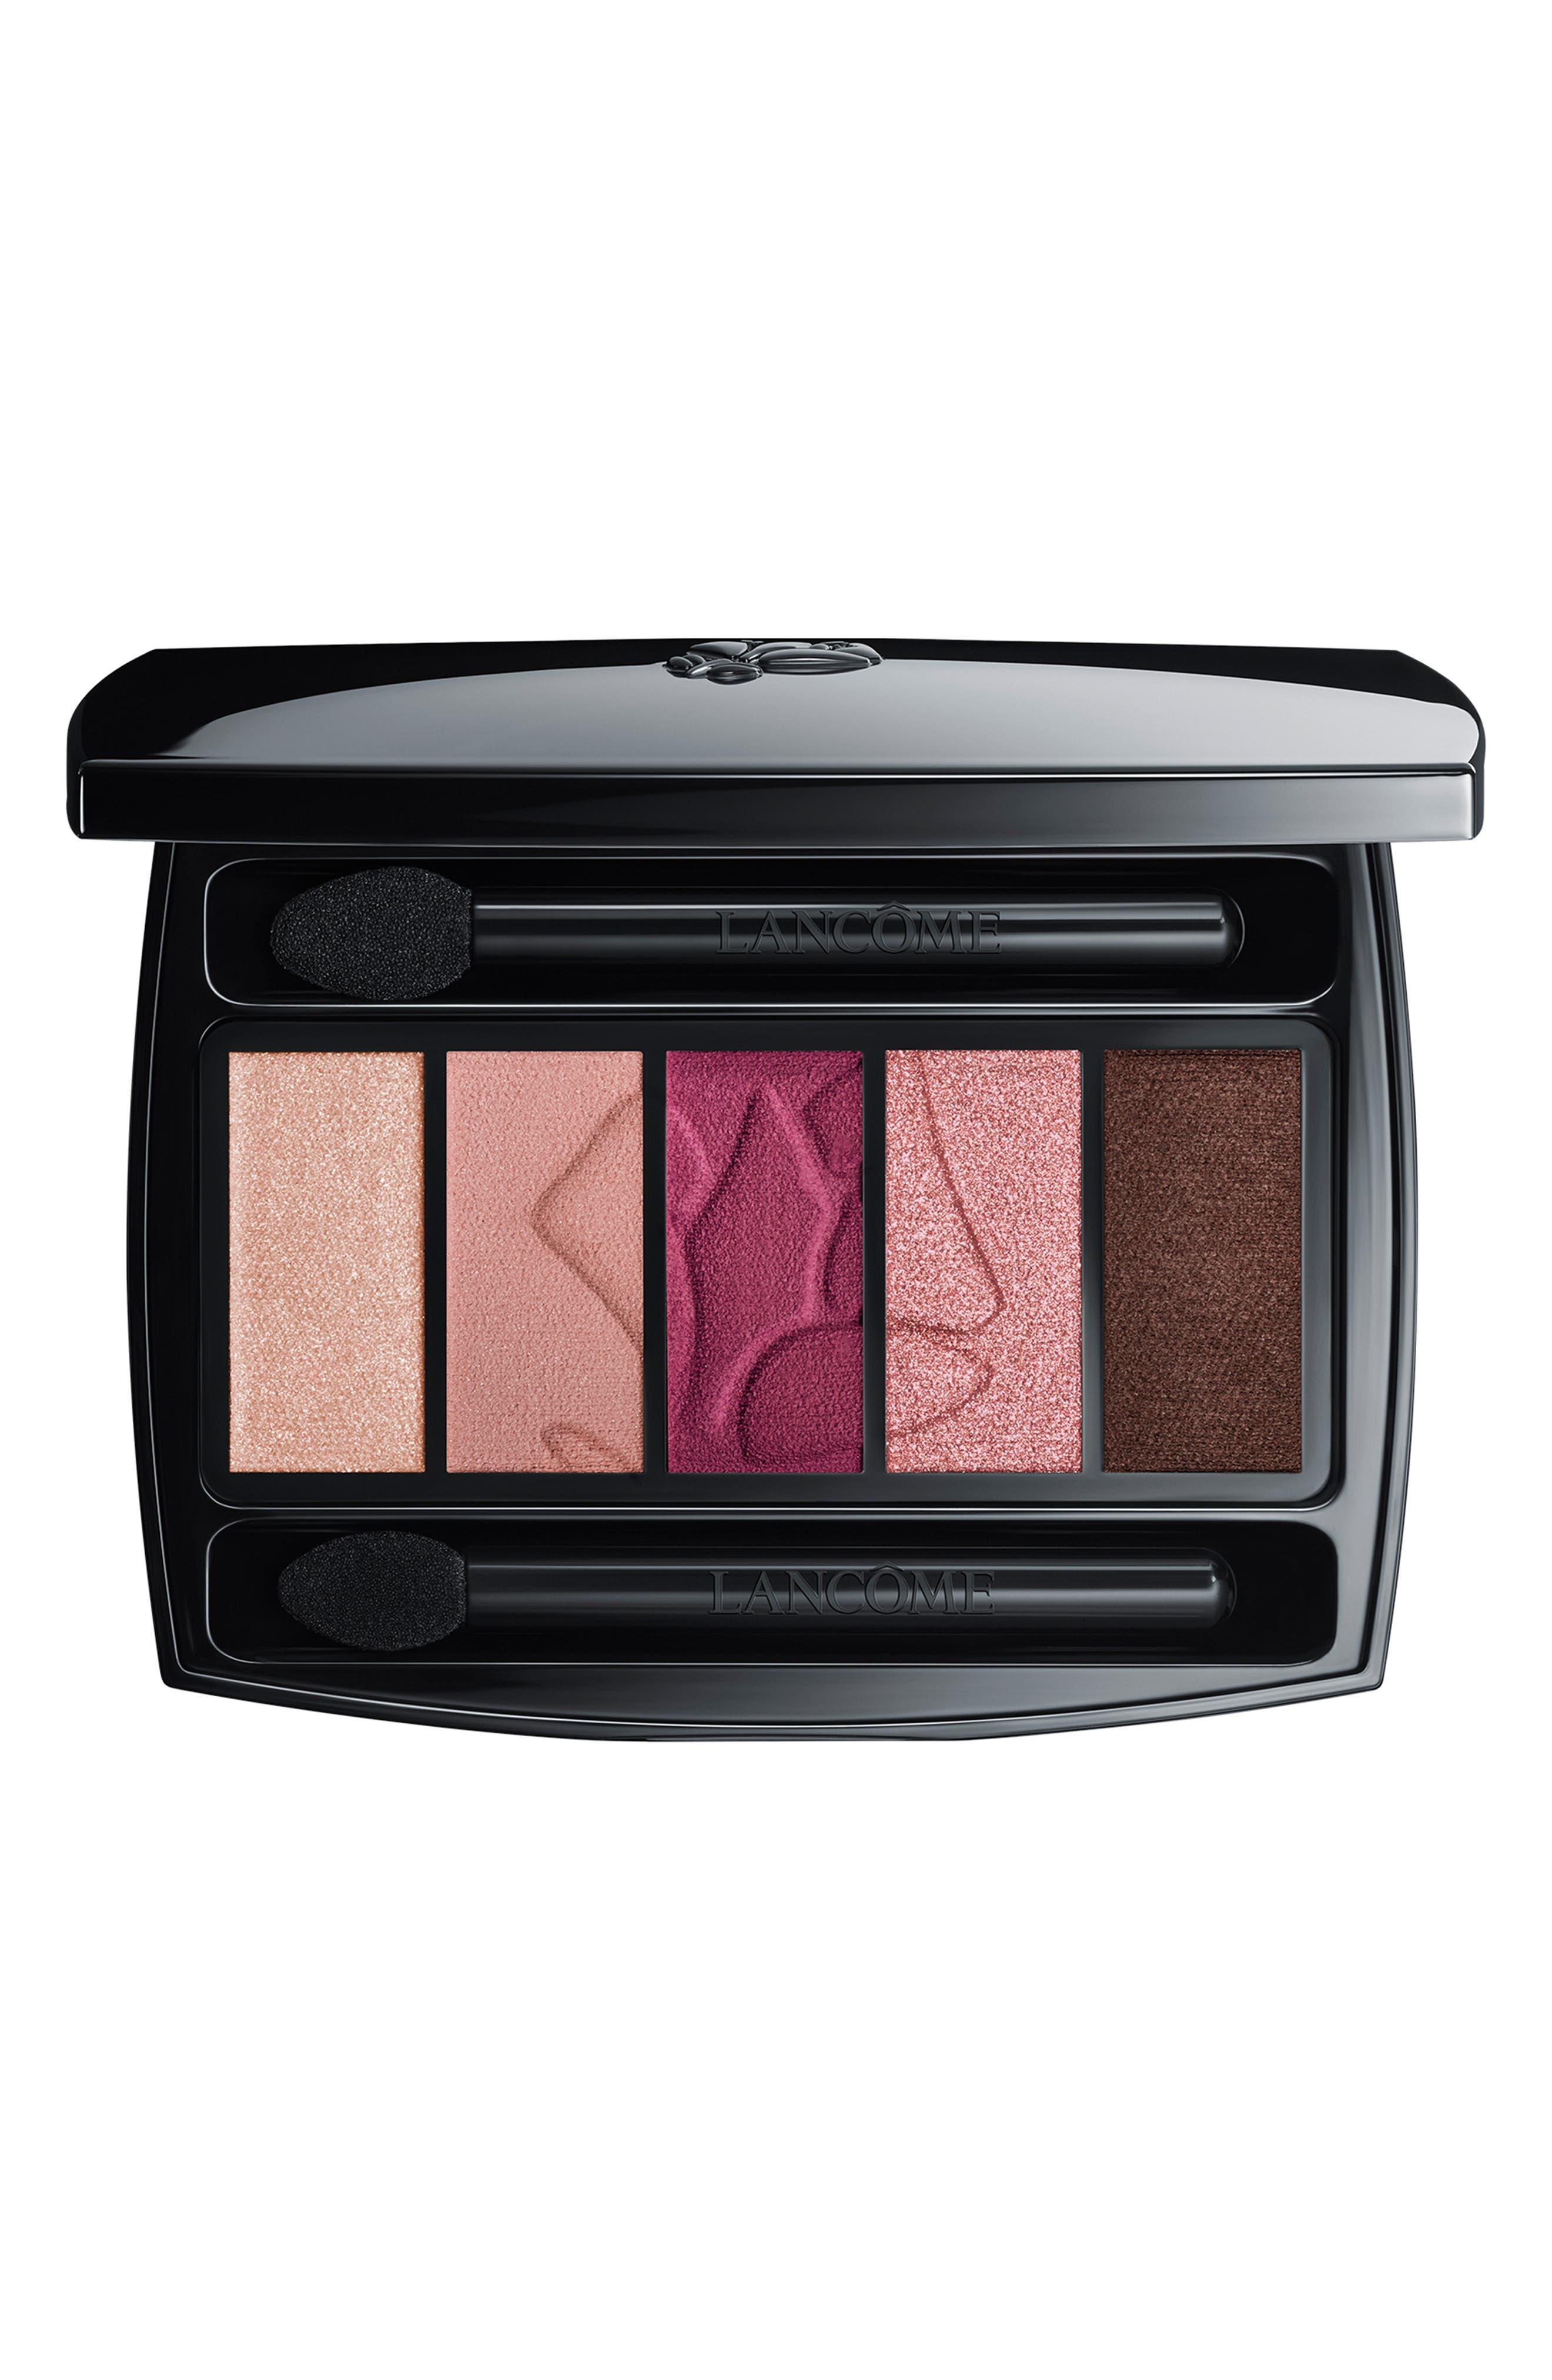 Lancome Color Design Eyeshadow Palette